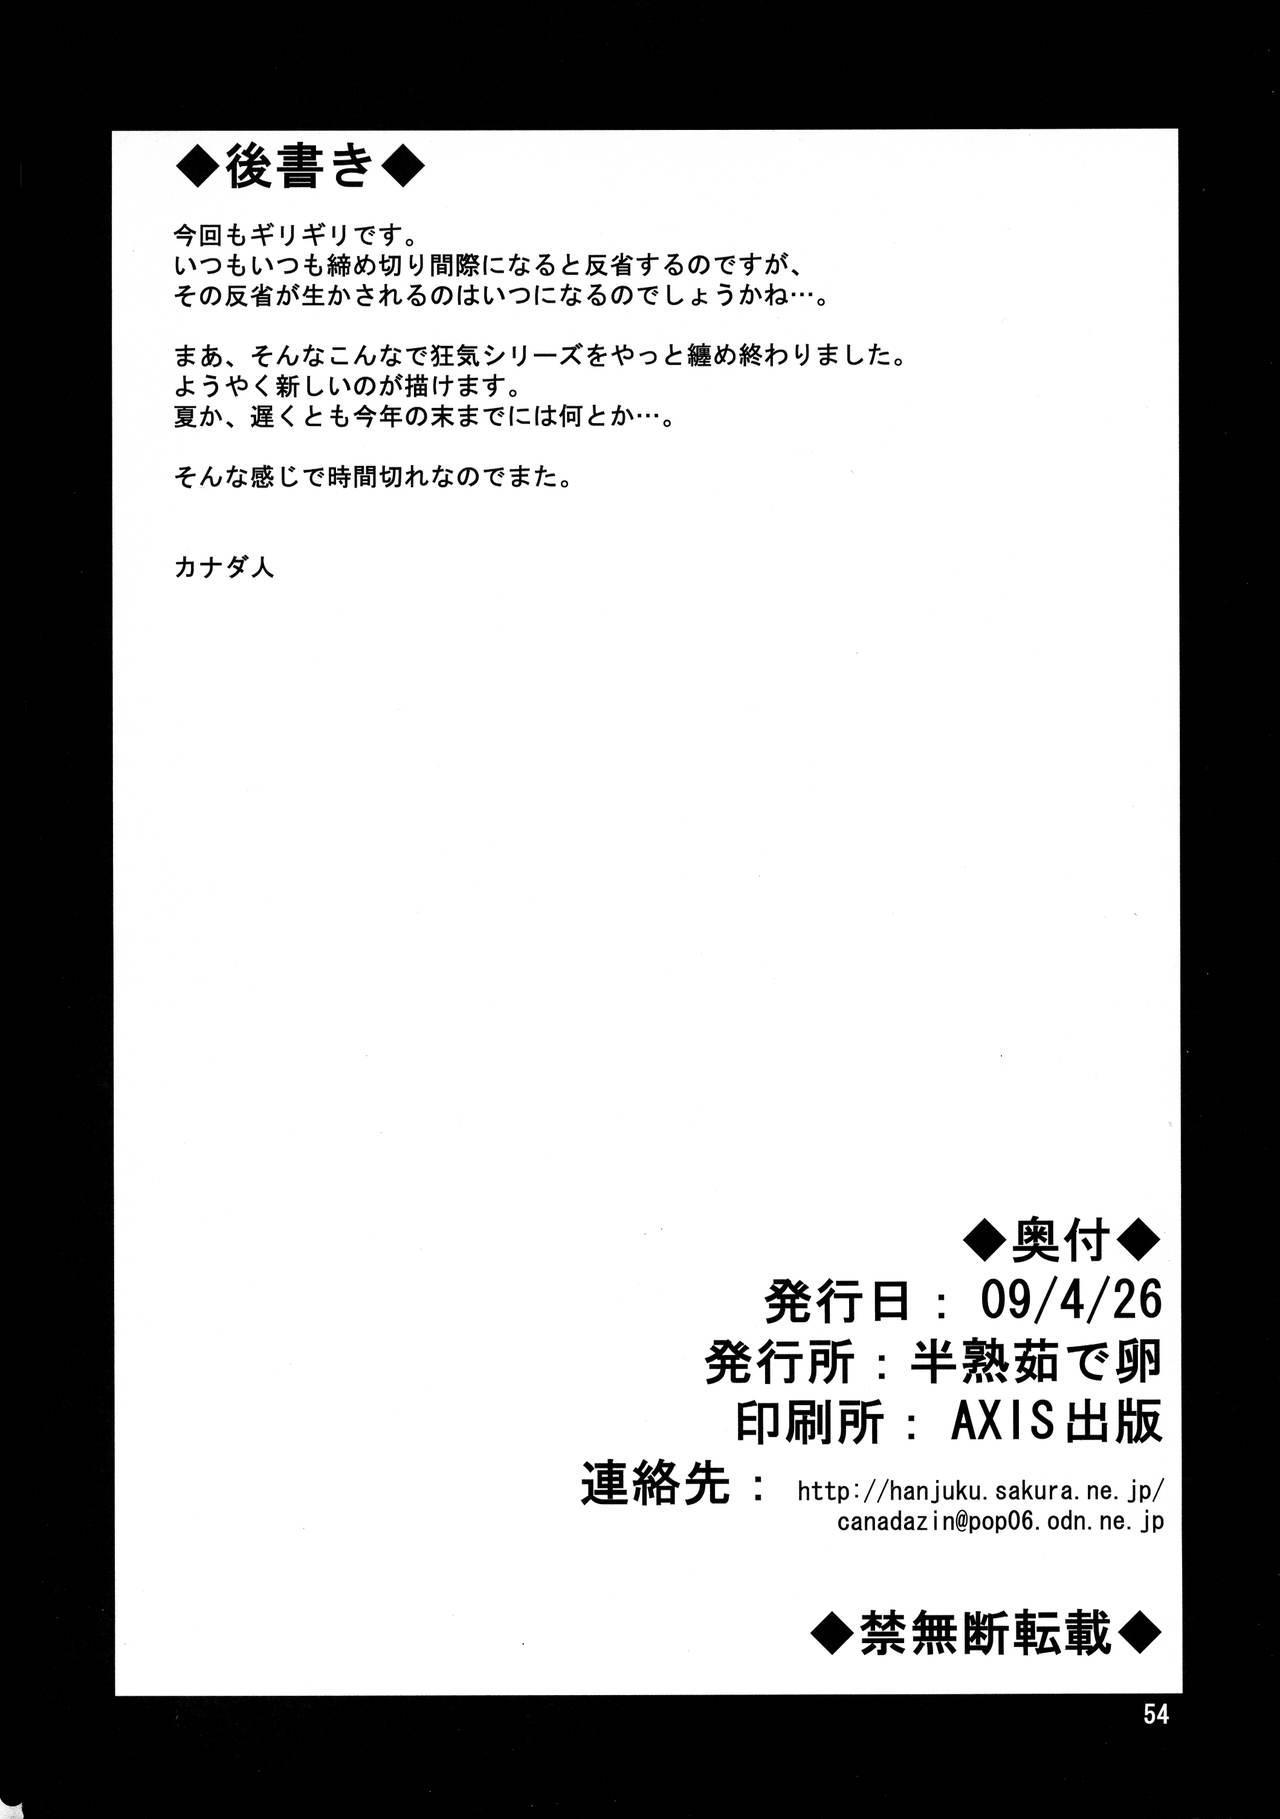 Kyouki Vol. 3~5 Remake Ver. 53